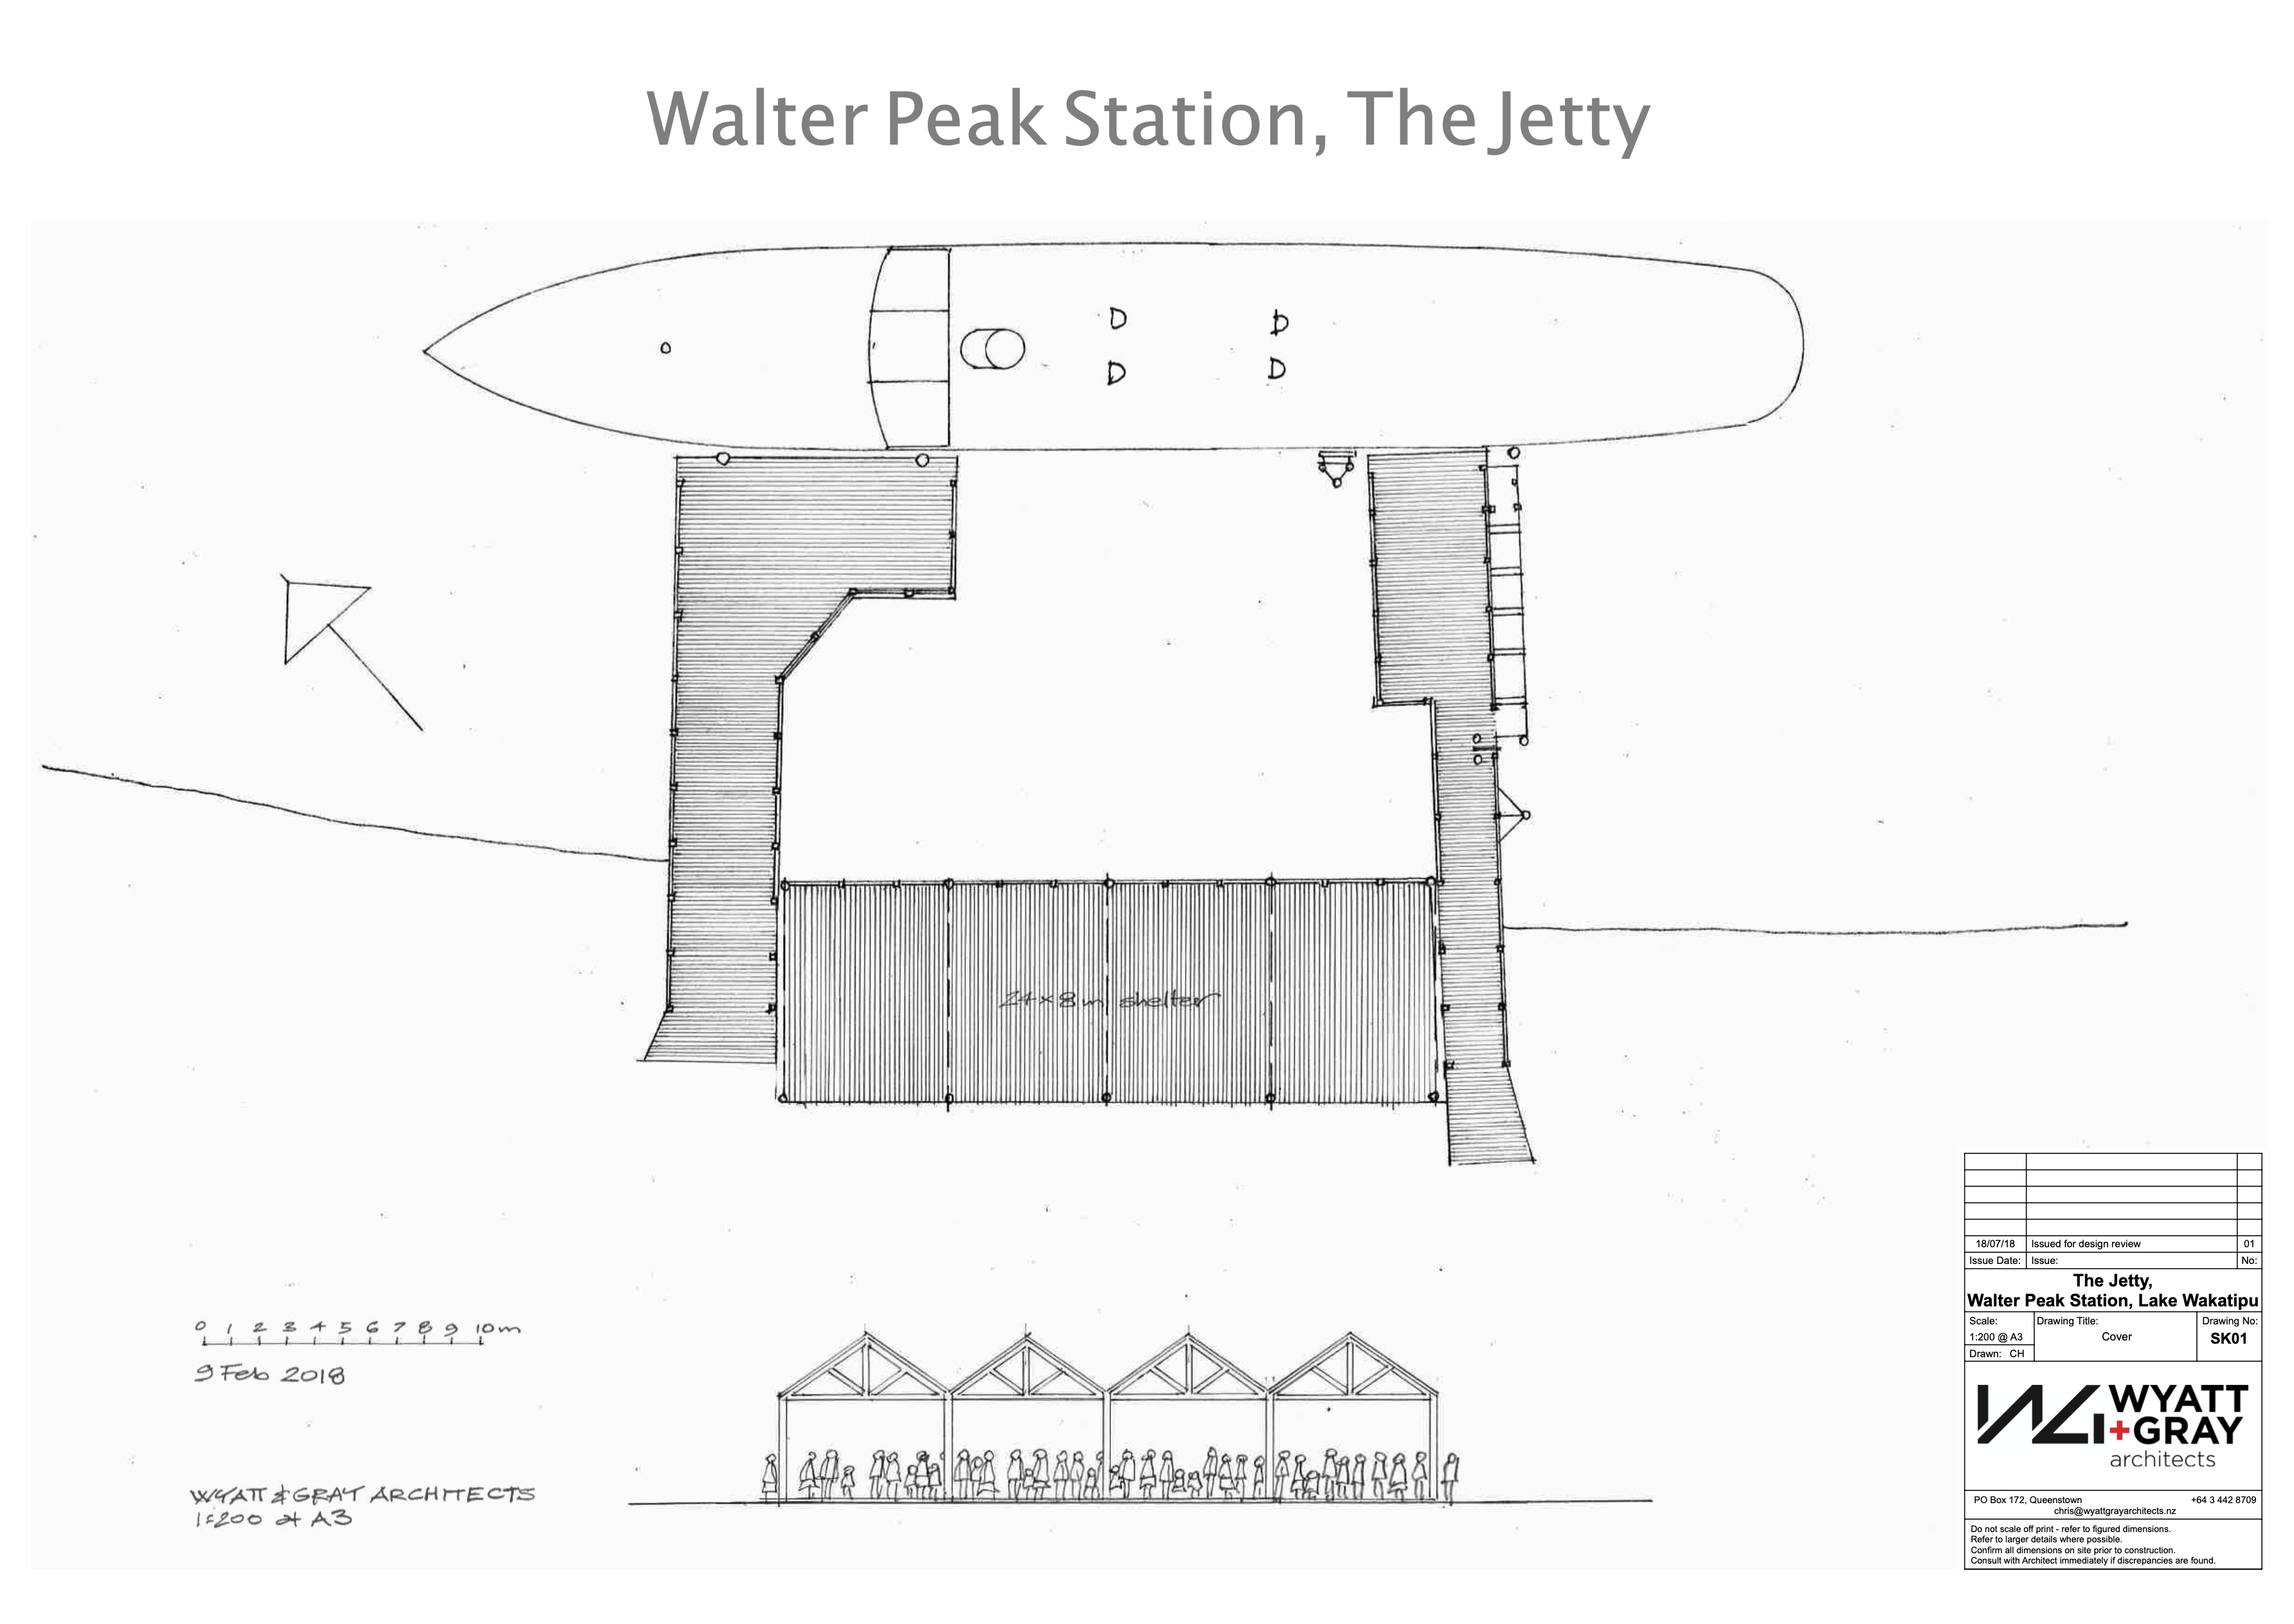 WPS Jetty Proposal